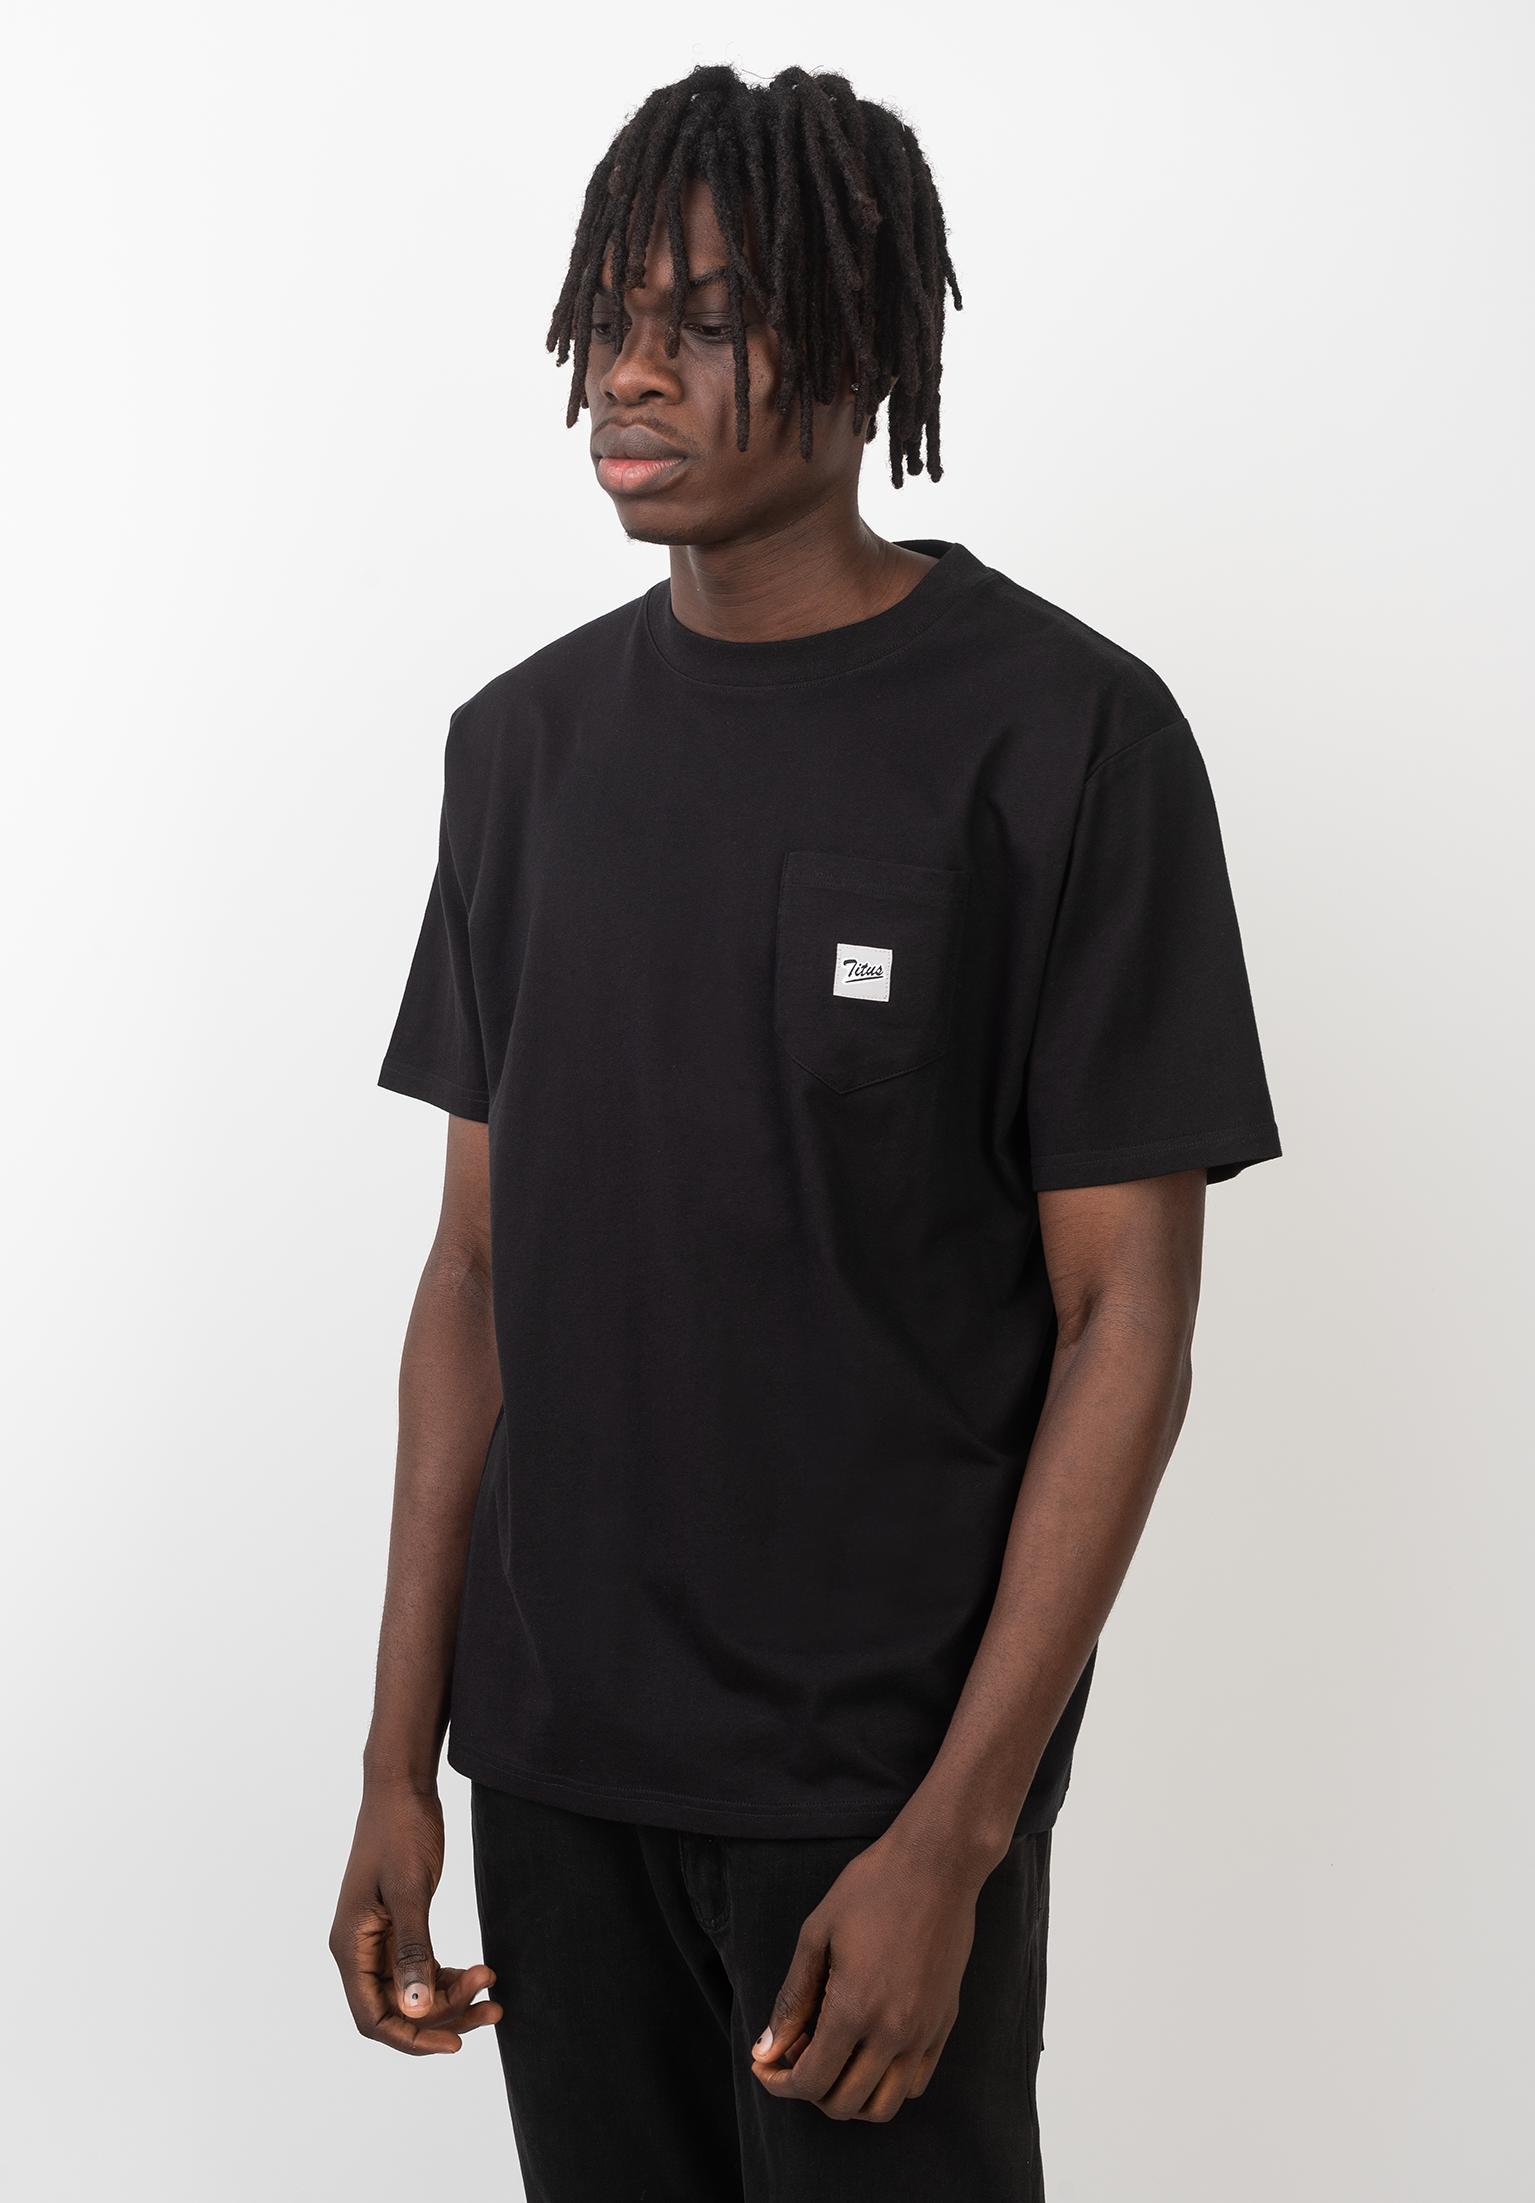 55e72d1aa Buy mens T-Shirts online | titus.de | Titus